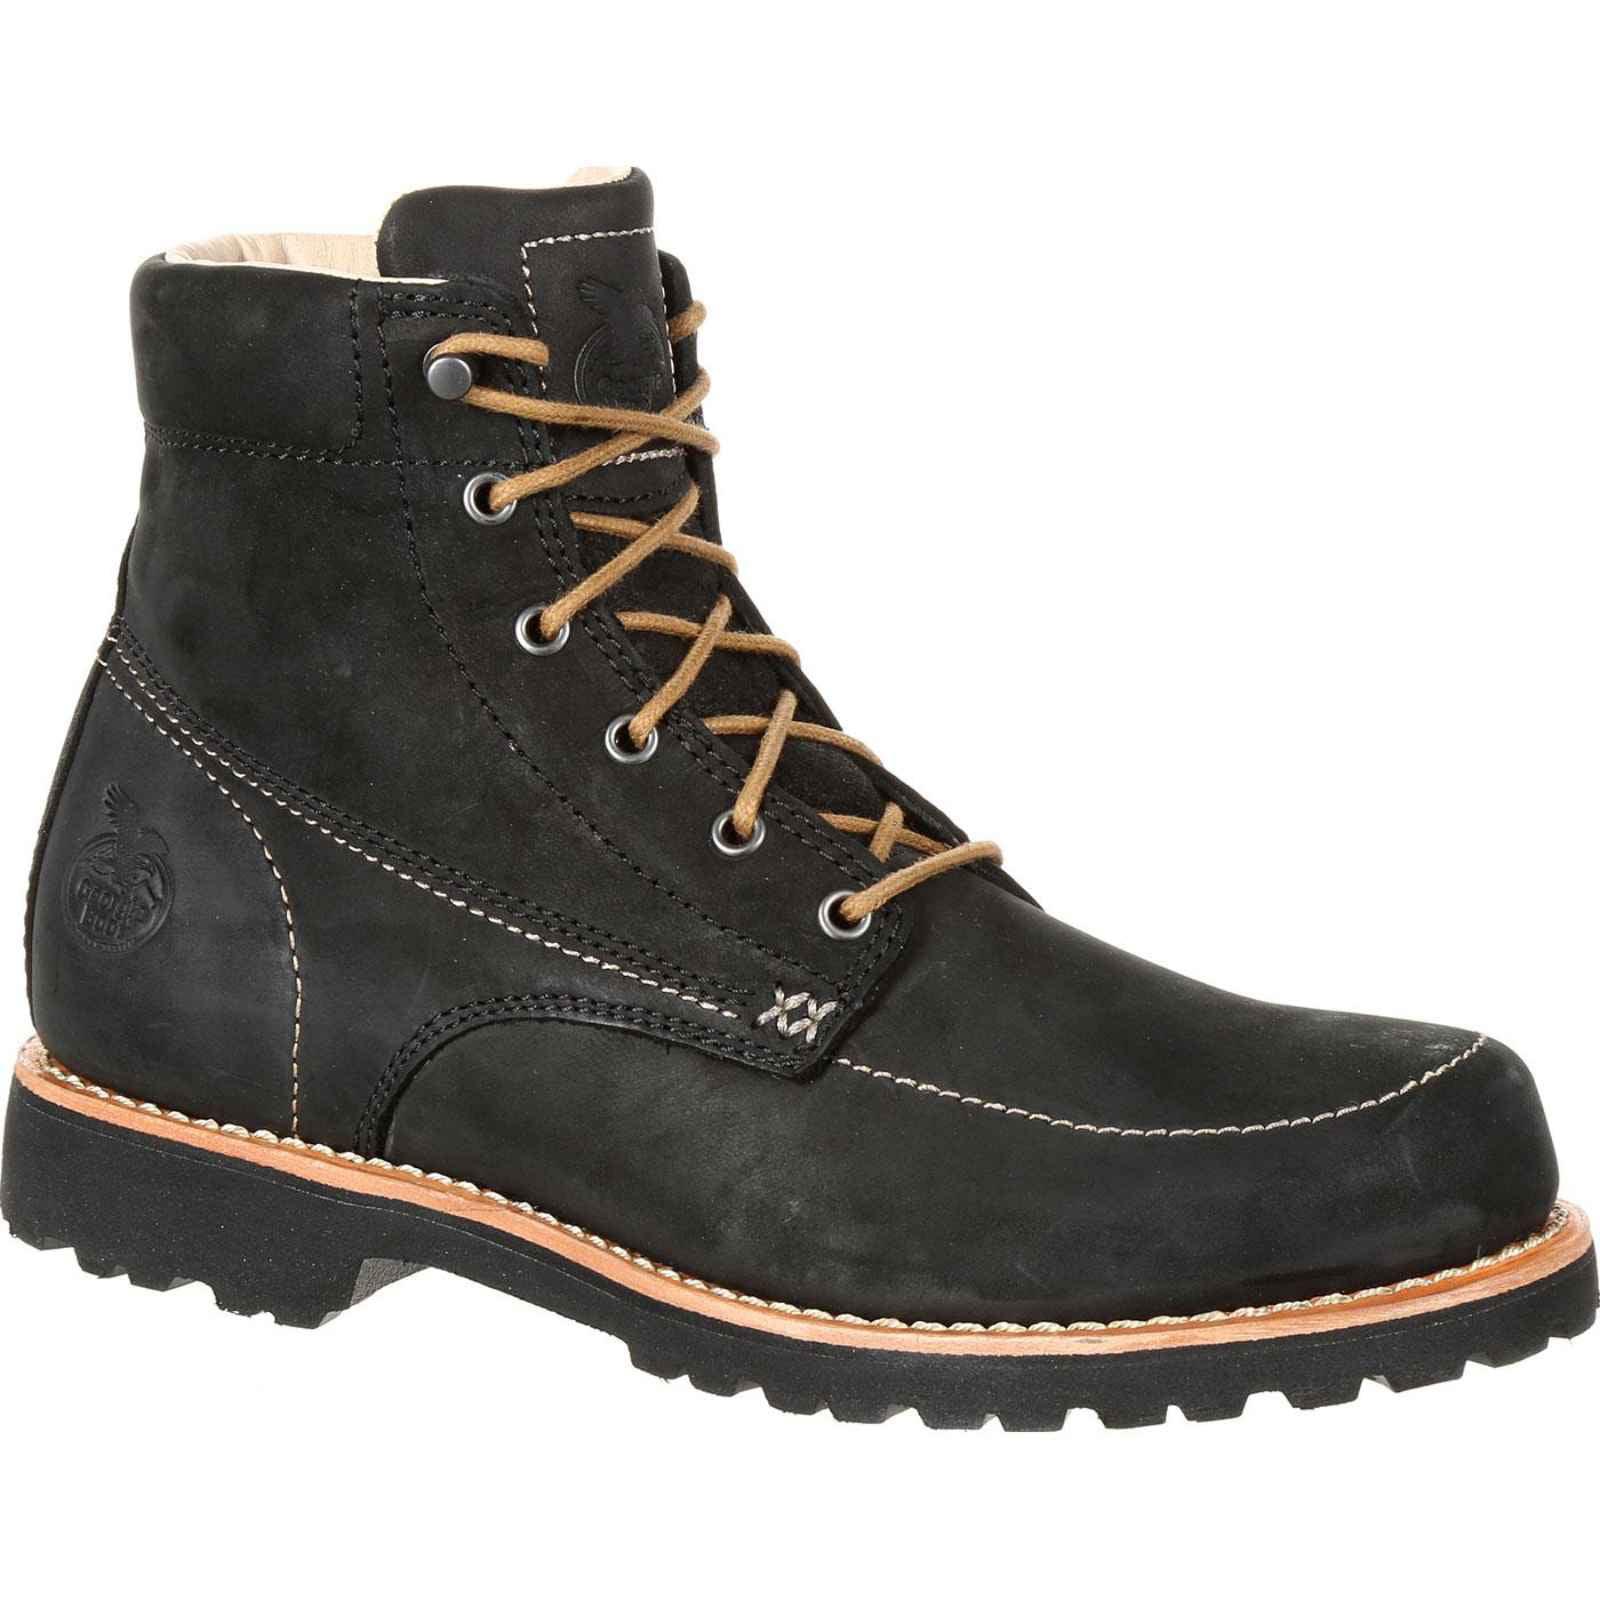 Georgia Boot Men's Black Small Batch Comfortable Stylish Casual Boot GB00173 by Georgia